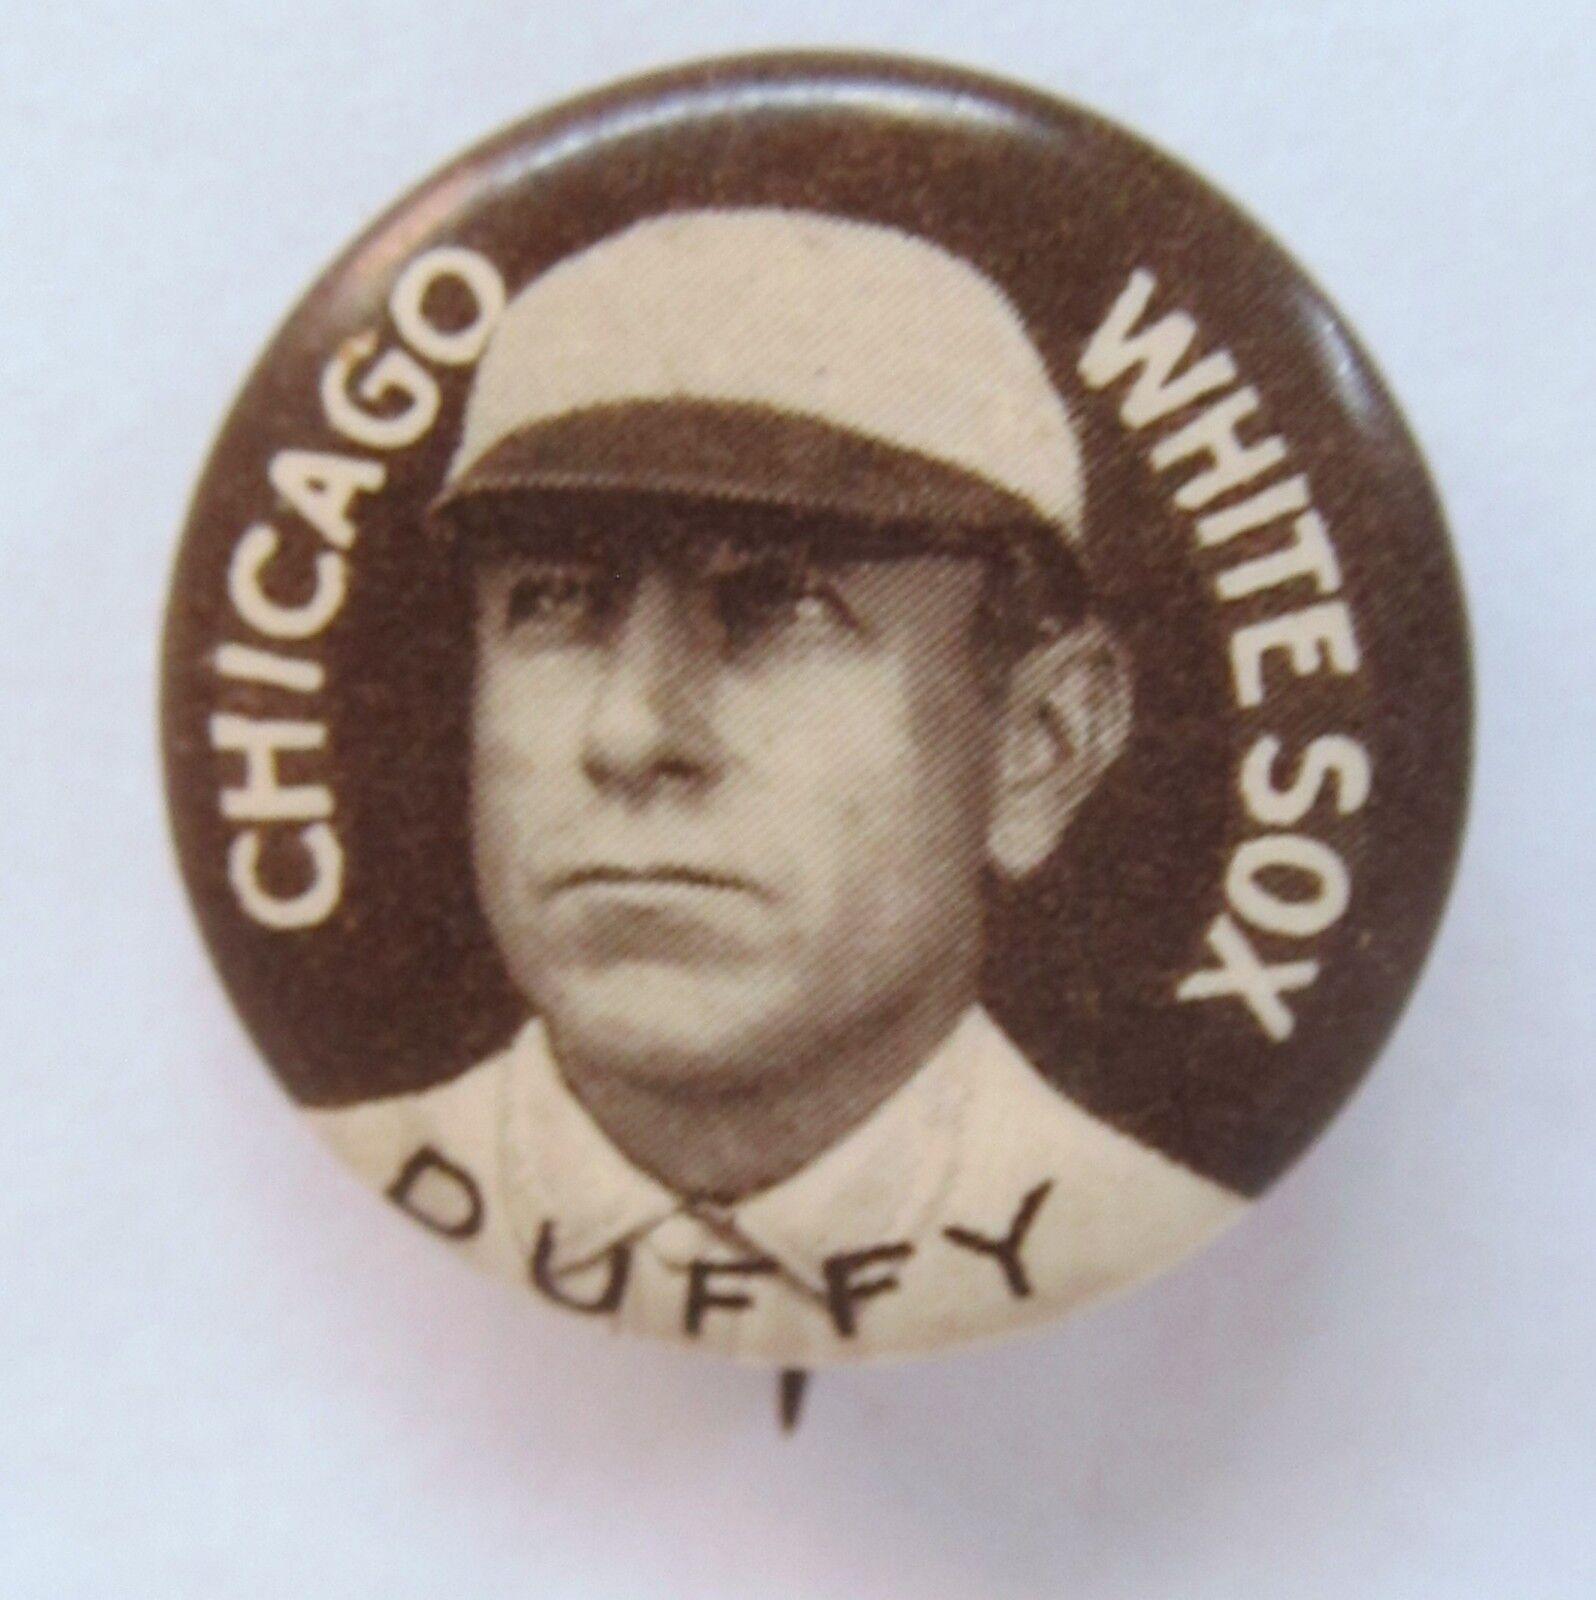 1910 P2 HUGH DUFFY grande ltr White Sox HALL OF FAME (TÊTE DU RENOMMÉ) bouton pinback Sweet Caporal